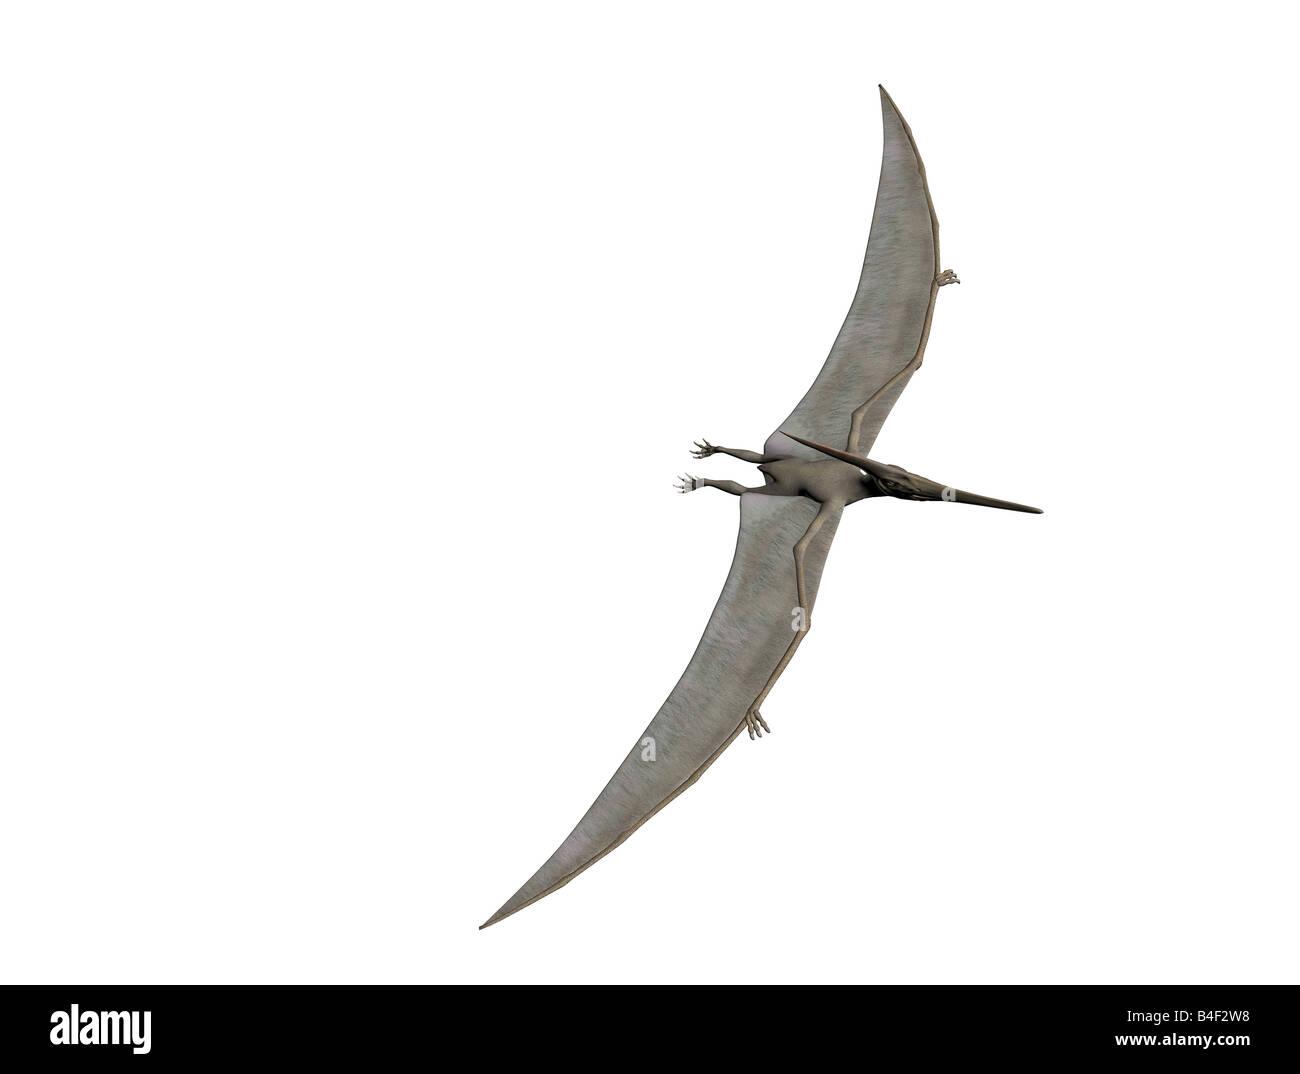 Dinosaur Pterodactyl Pteranodon Flying Stock Photos   Dinosaur ... 09766b14c